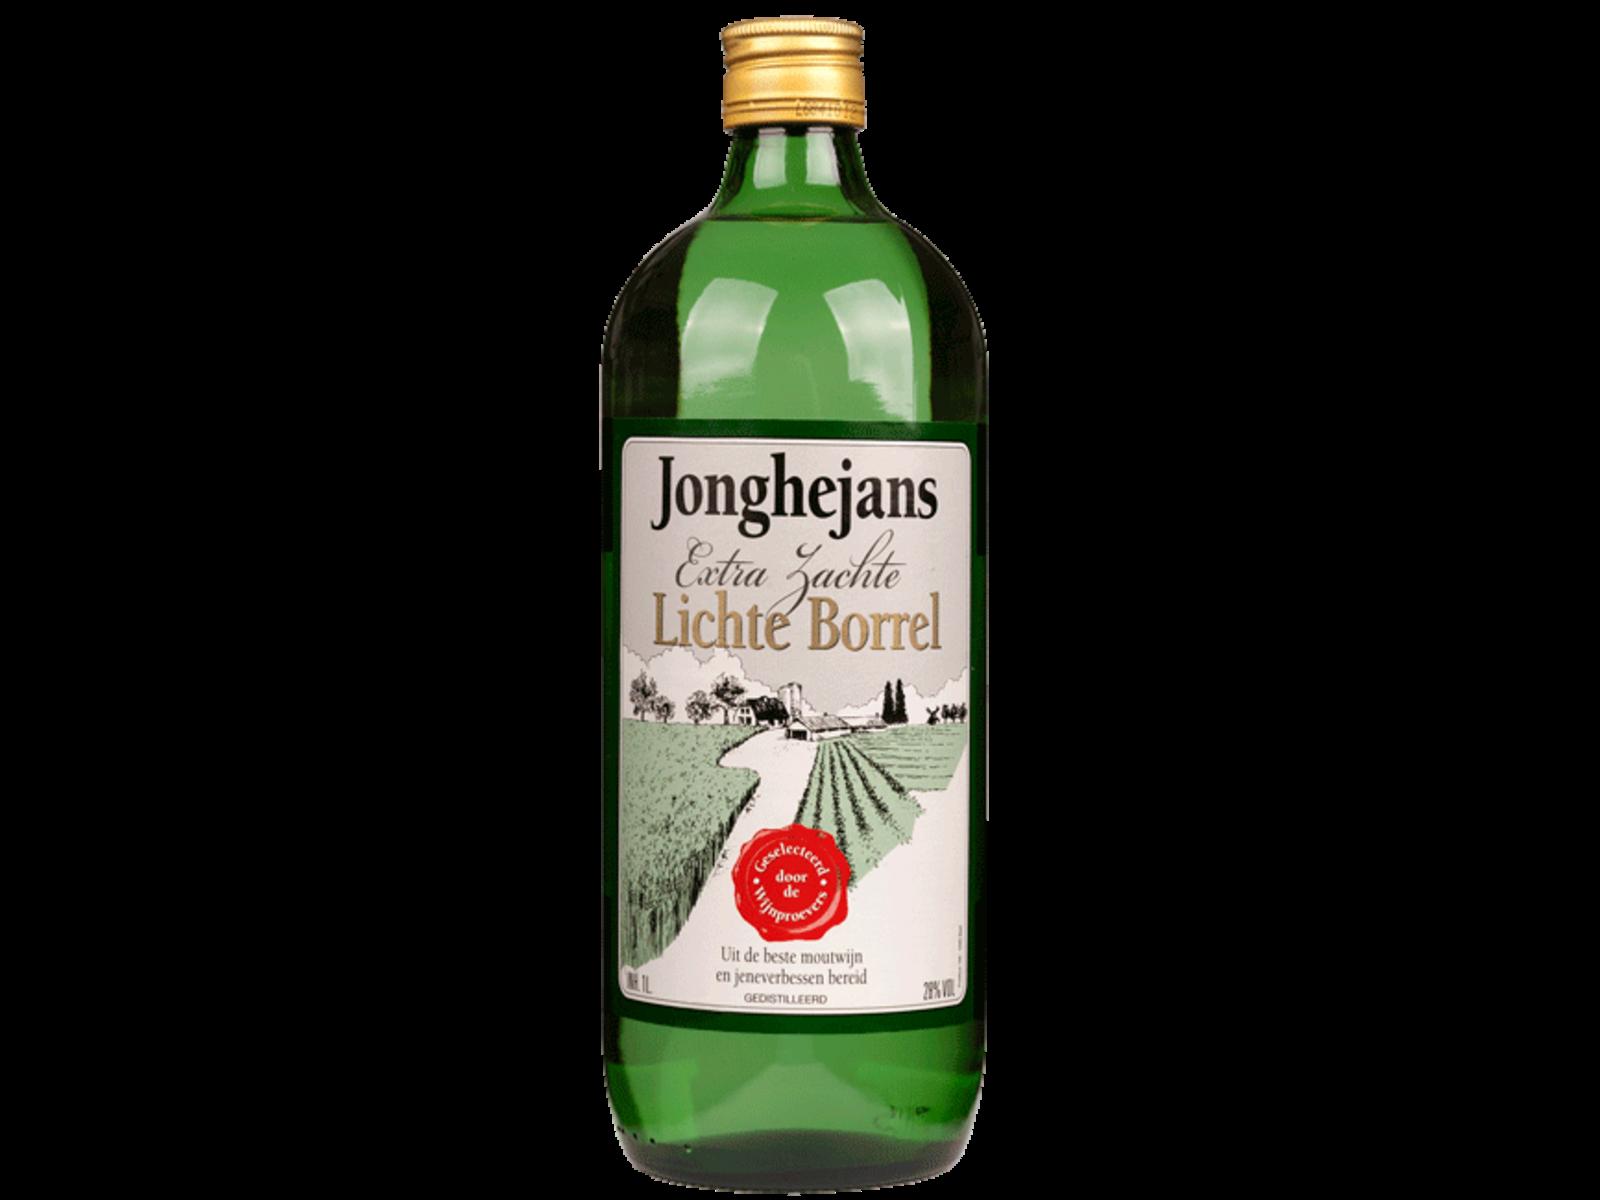 Jonghejans Jonghejans Lichte Borrel / 1L